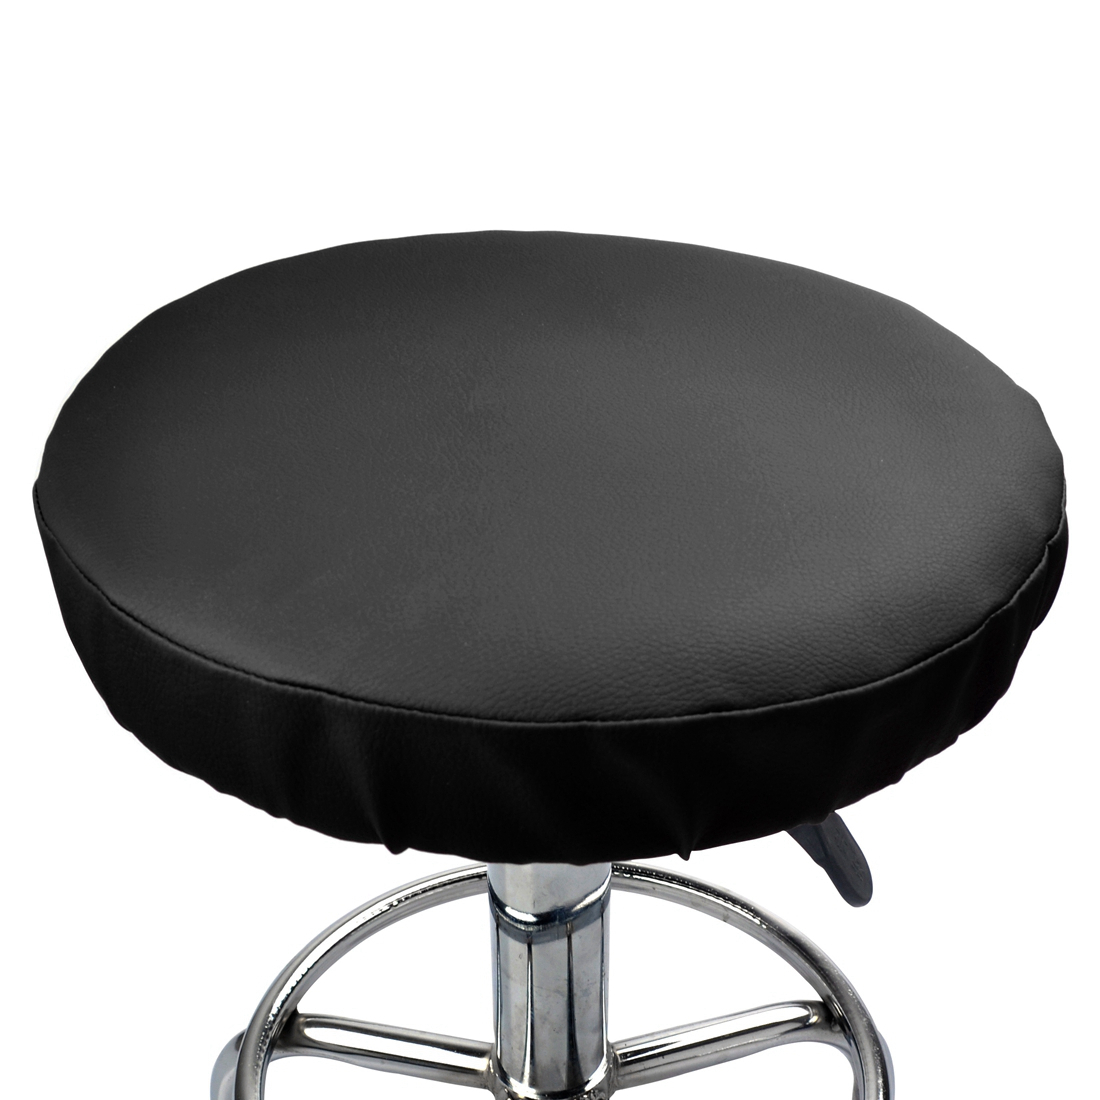 Awe Inspiring Best Dental Chairs Stool Ideas And Get Free Shipping 4K89Ef4An Uwap Interior Chair Design Uwaporg